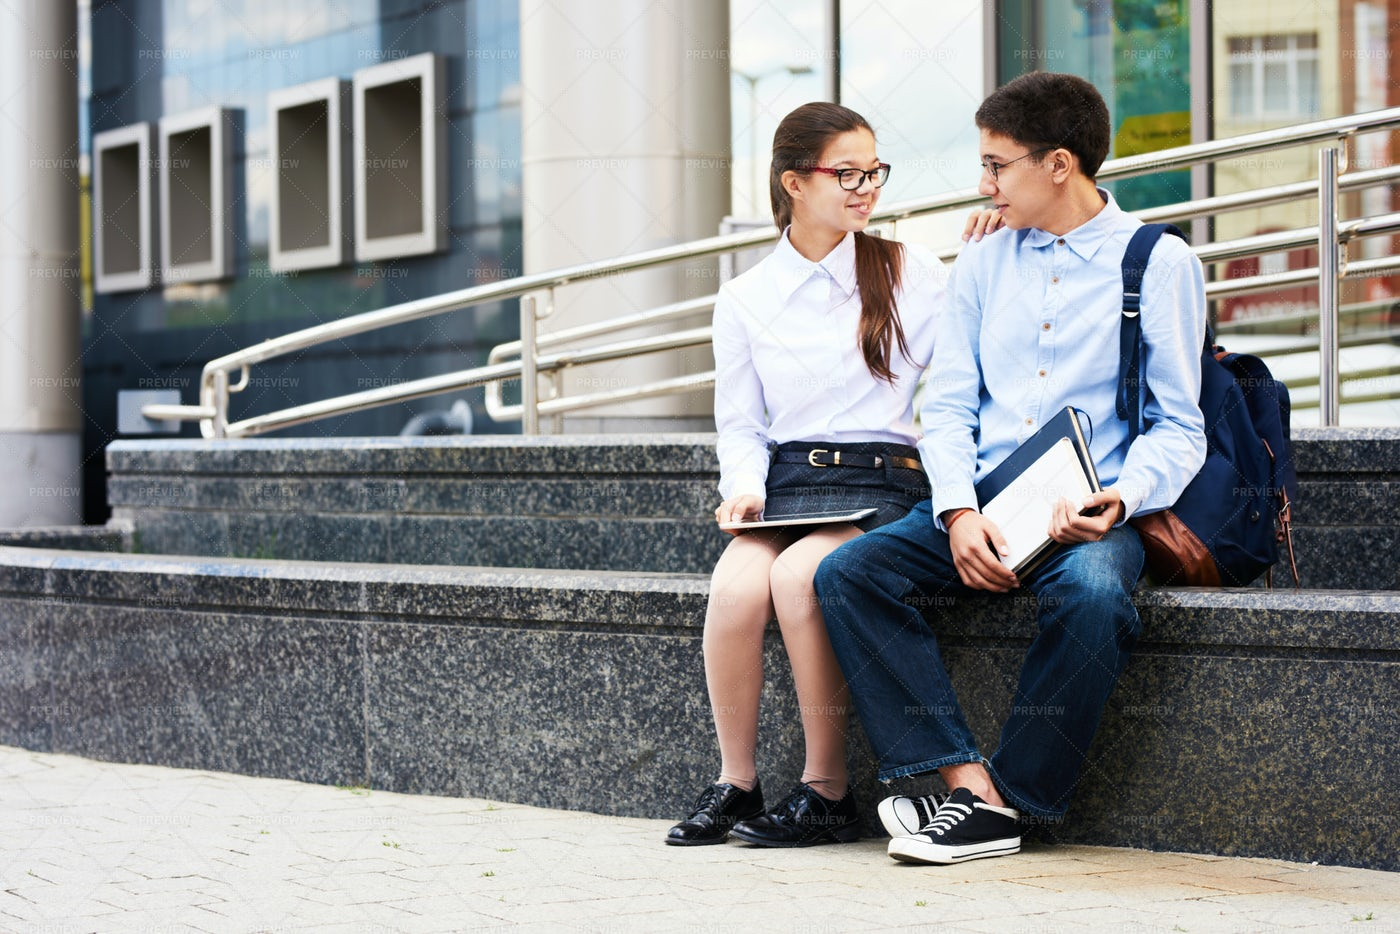 Teenage Couple In School Yard: Stock Photos